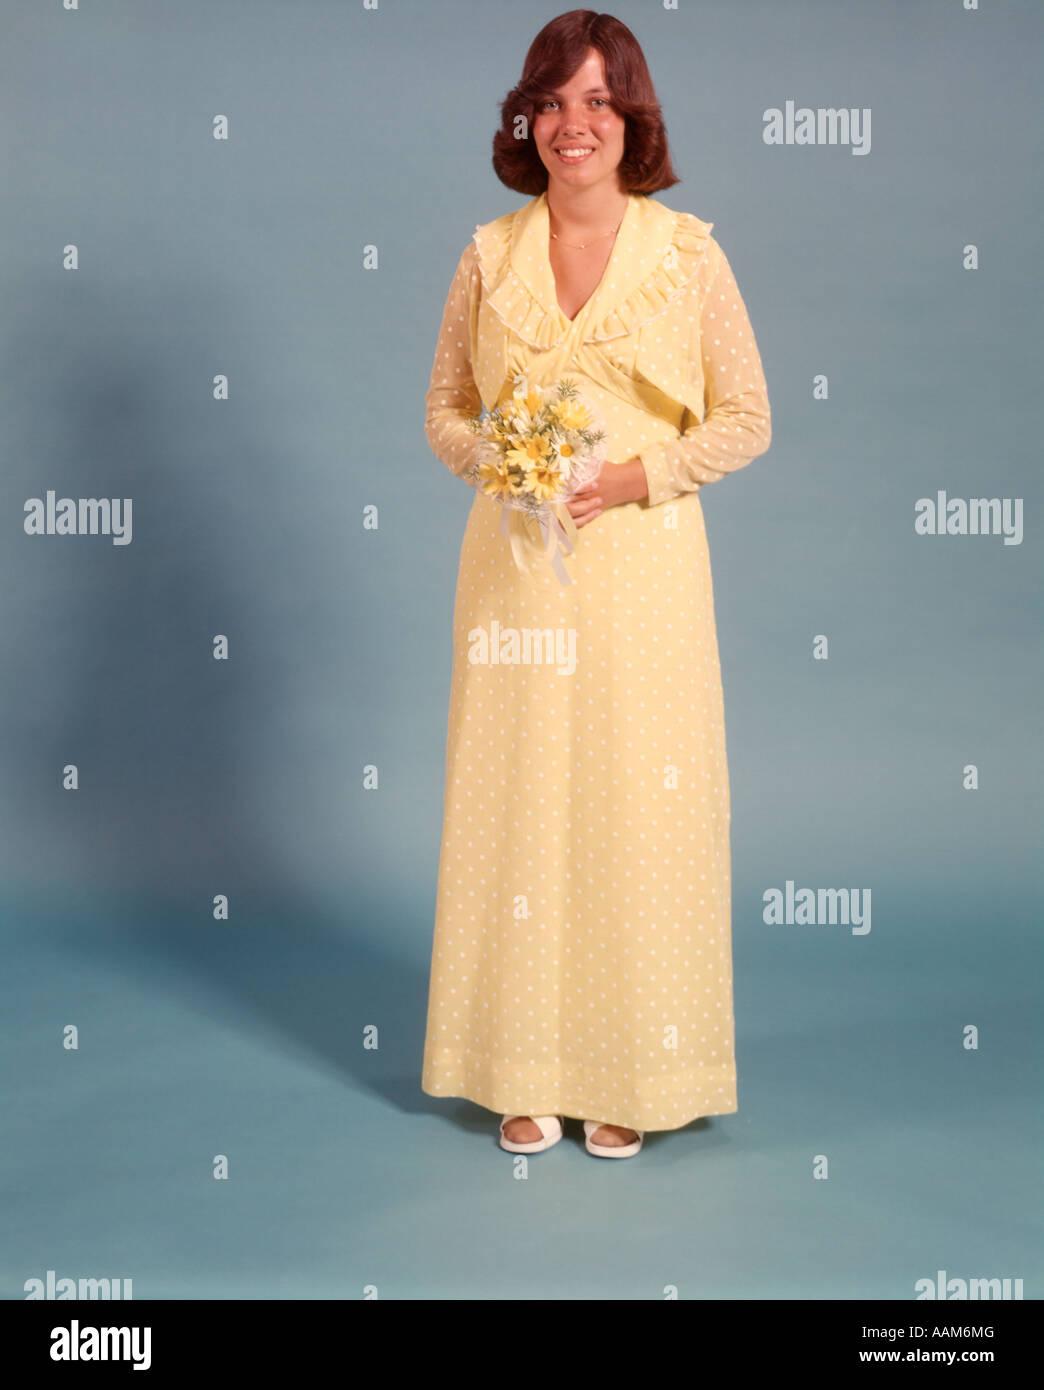 1970 S Prom Dresses - Homecoming Prom Dresses